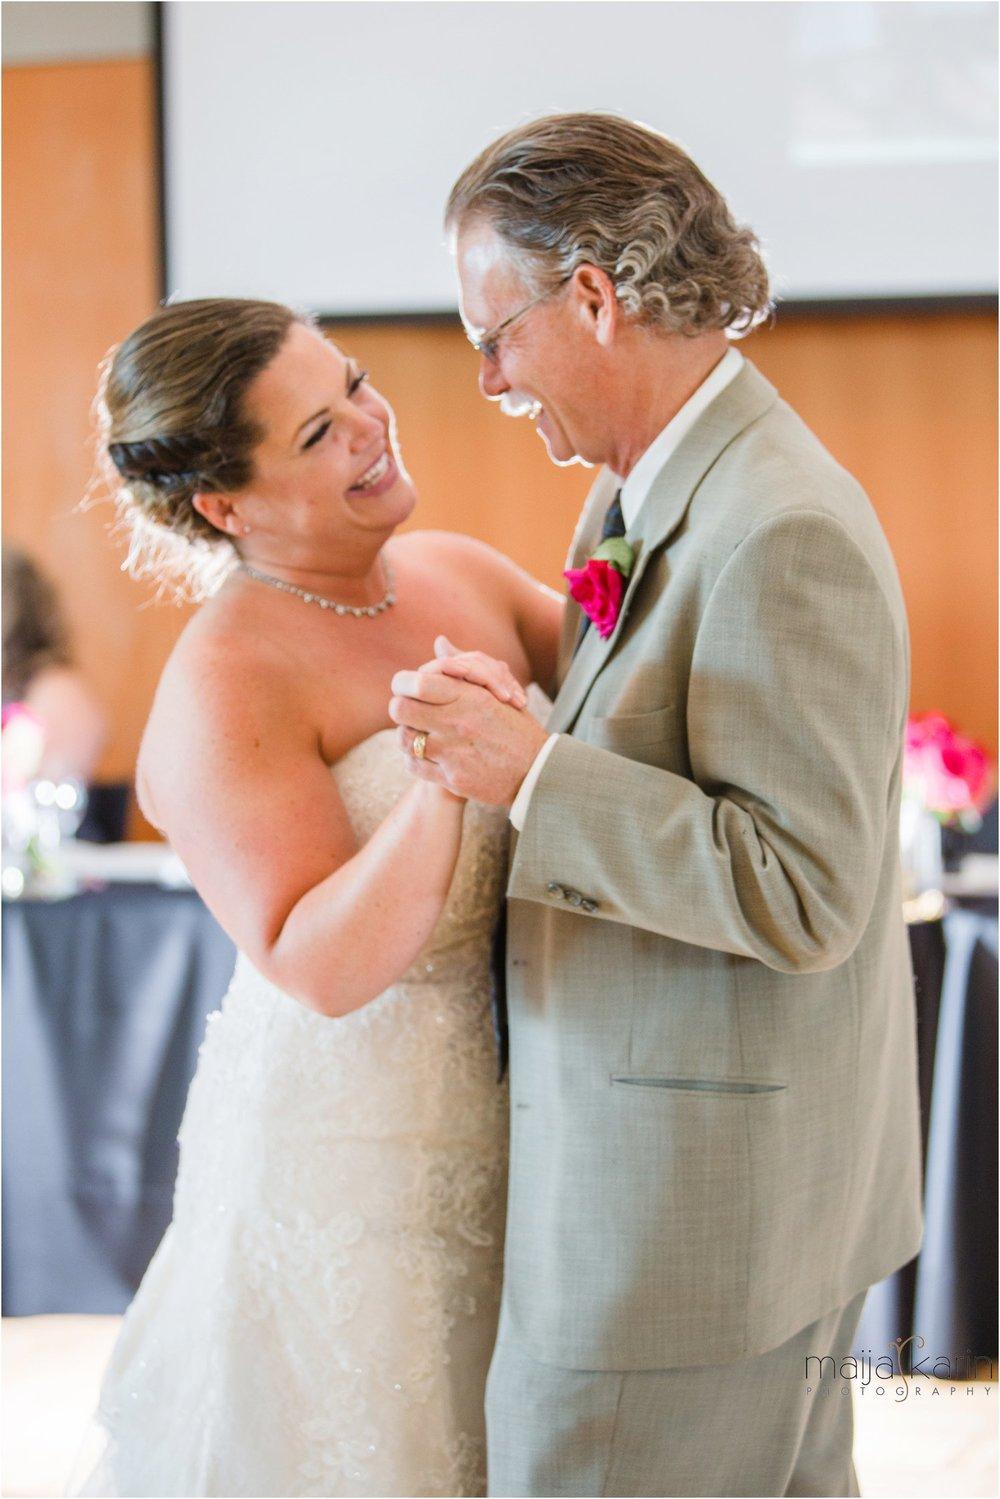 St-Aloysius-Spokane-Wedding-Maija-Karin-Photography_51.jpg